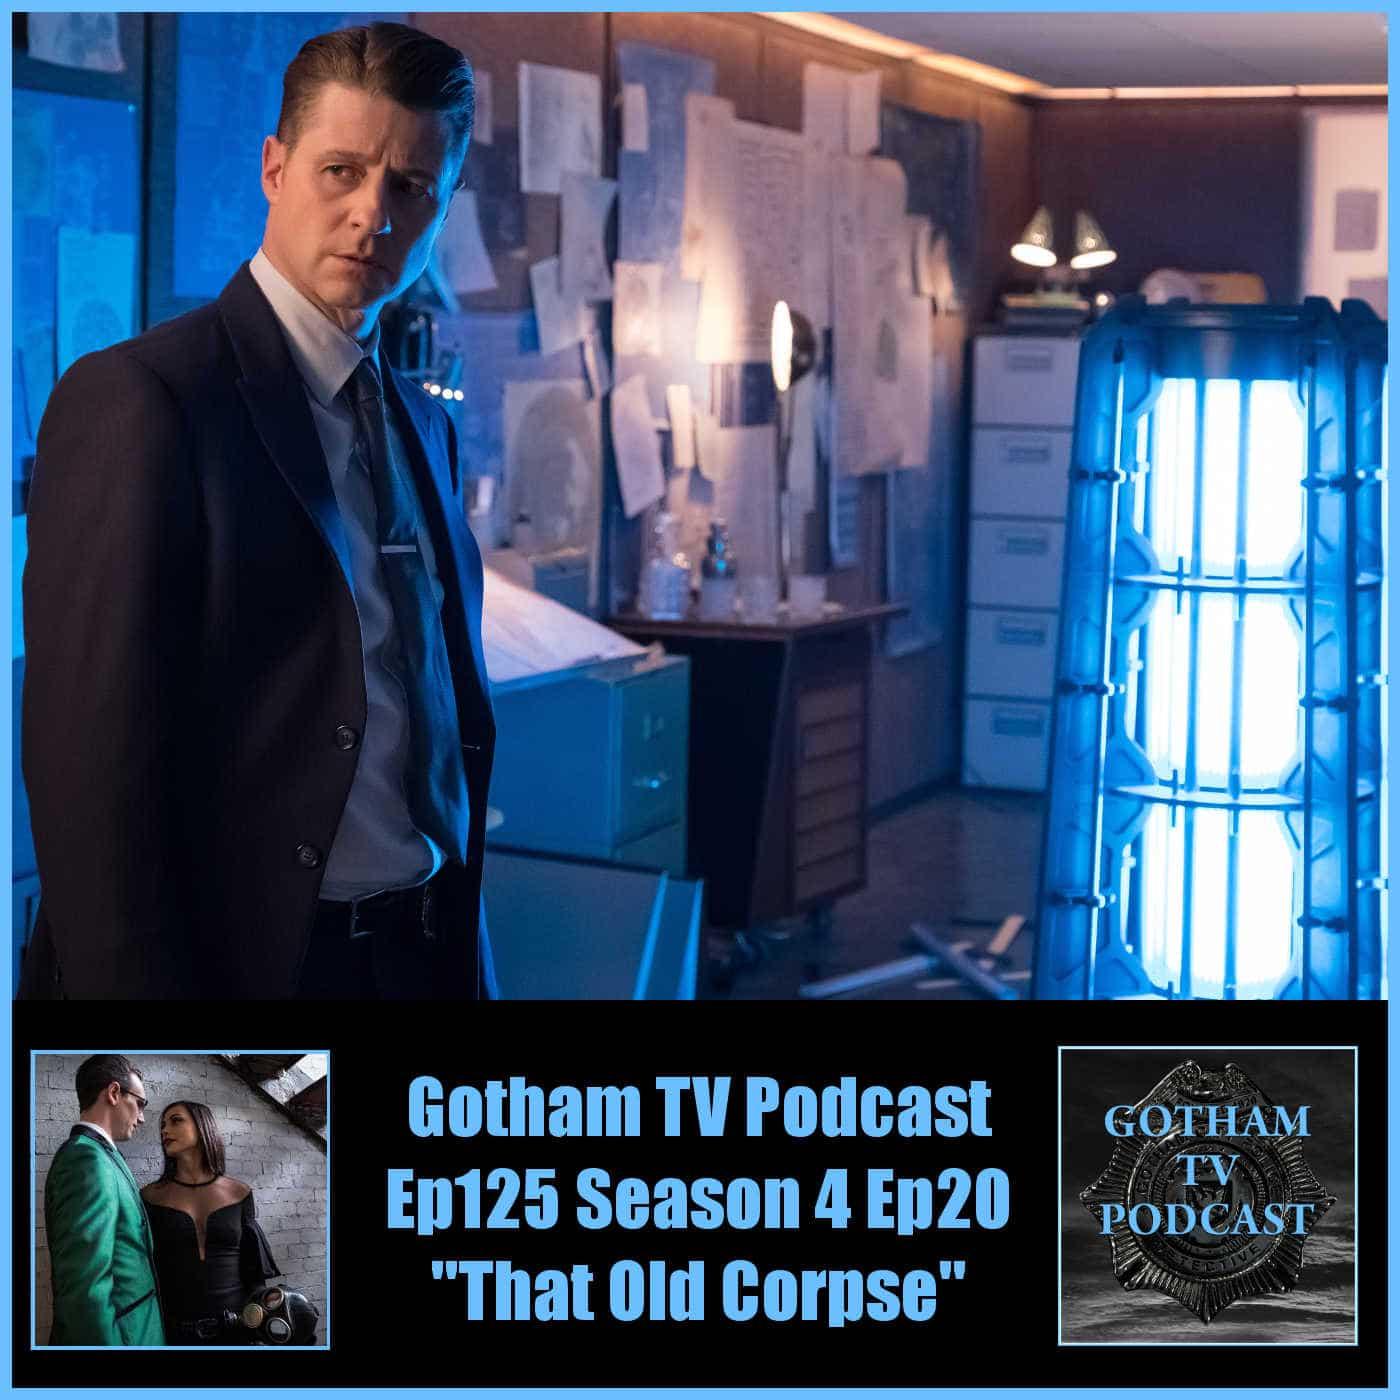 Gotham TV Podcast - The longest running podcast about Gotham